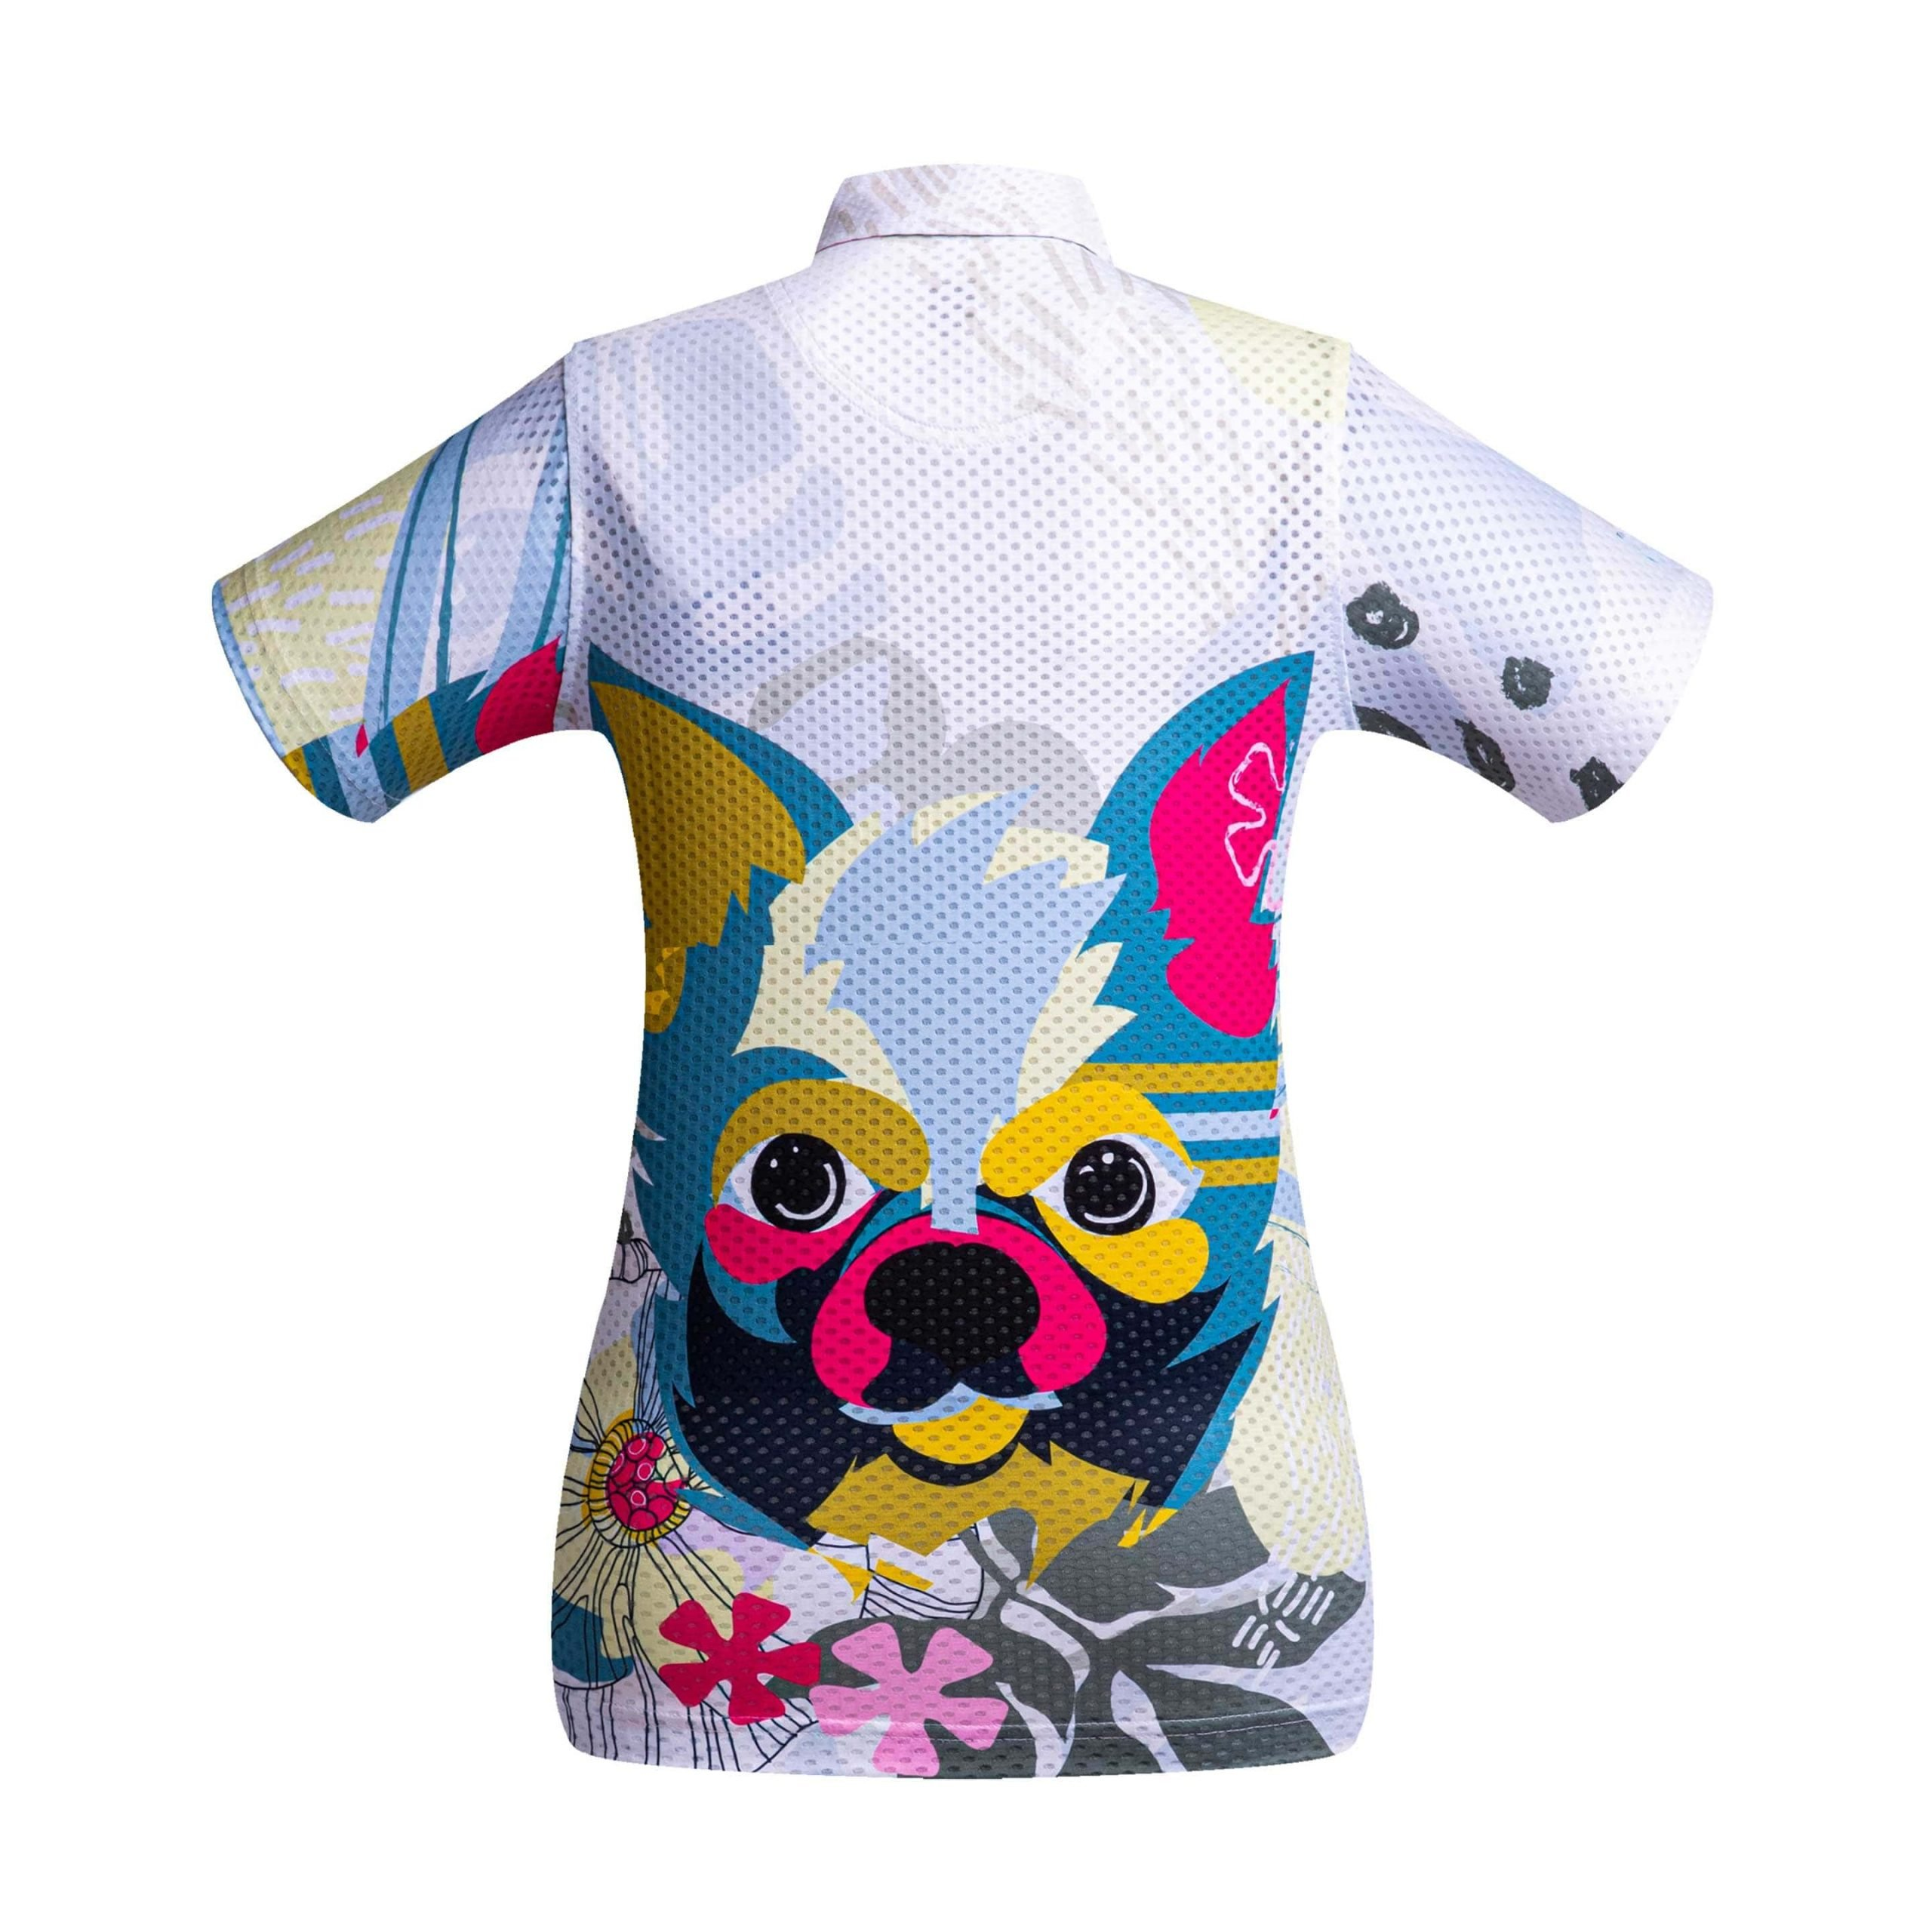 Golf shirt - Chihuahua